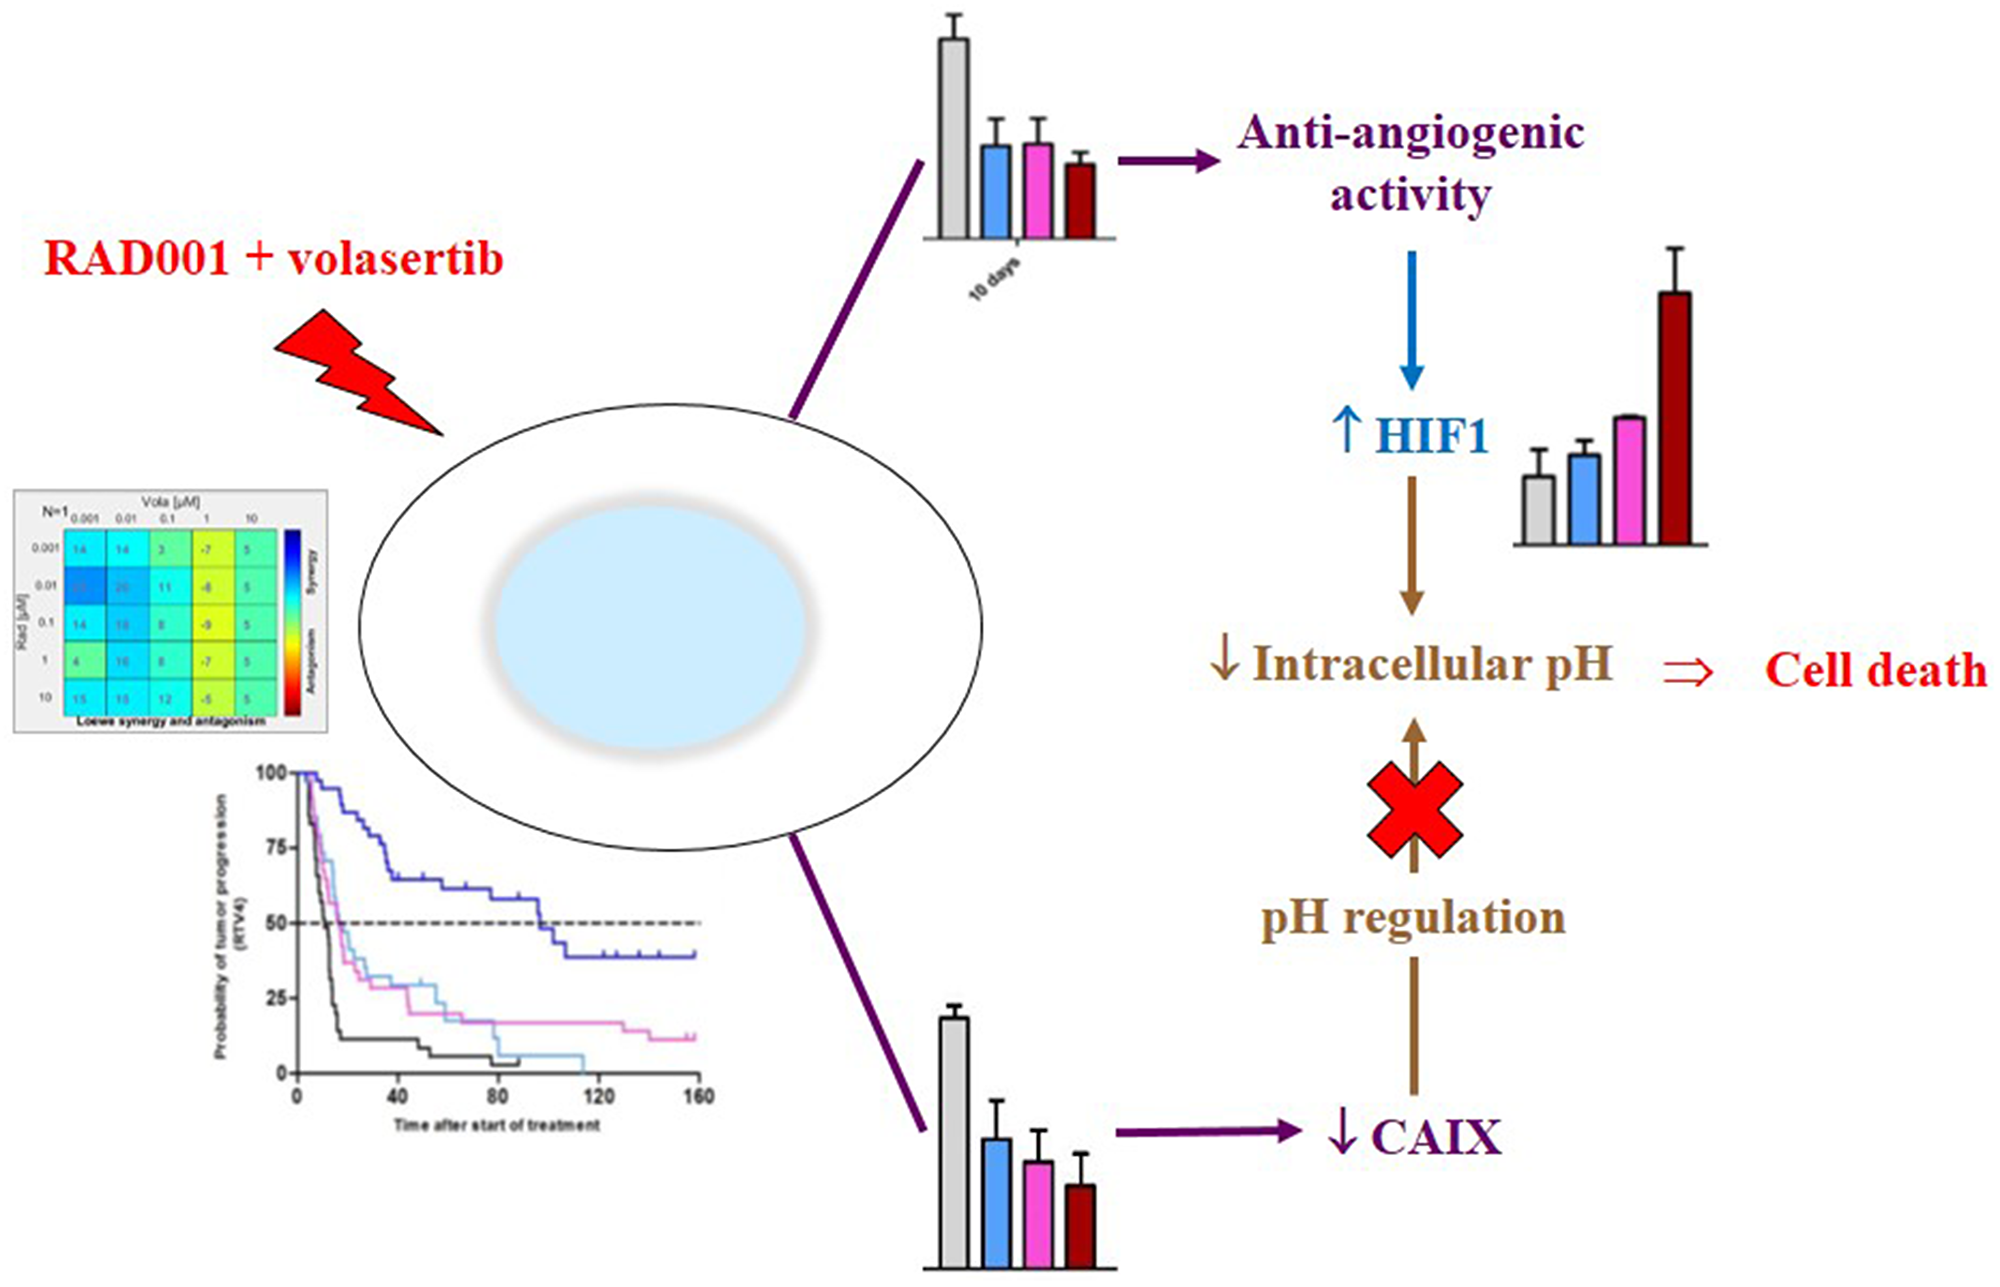 Mechanism of the antitumor activity of the RAD001 (everolimus) + volasertib combination.